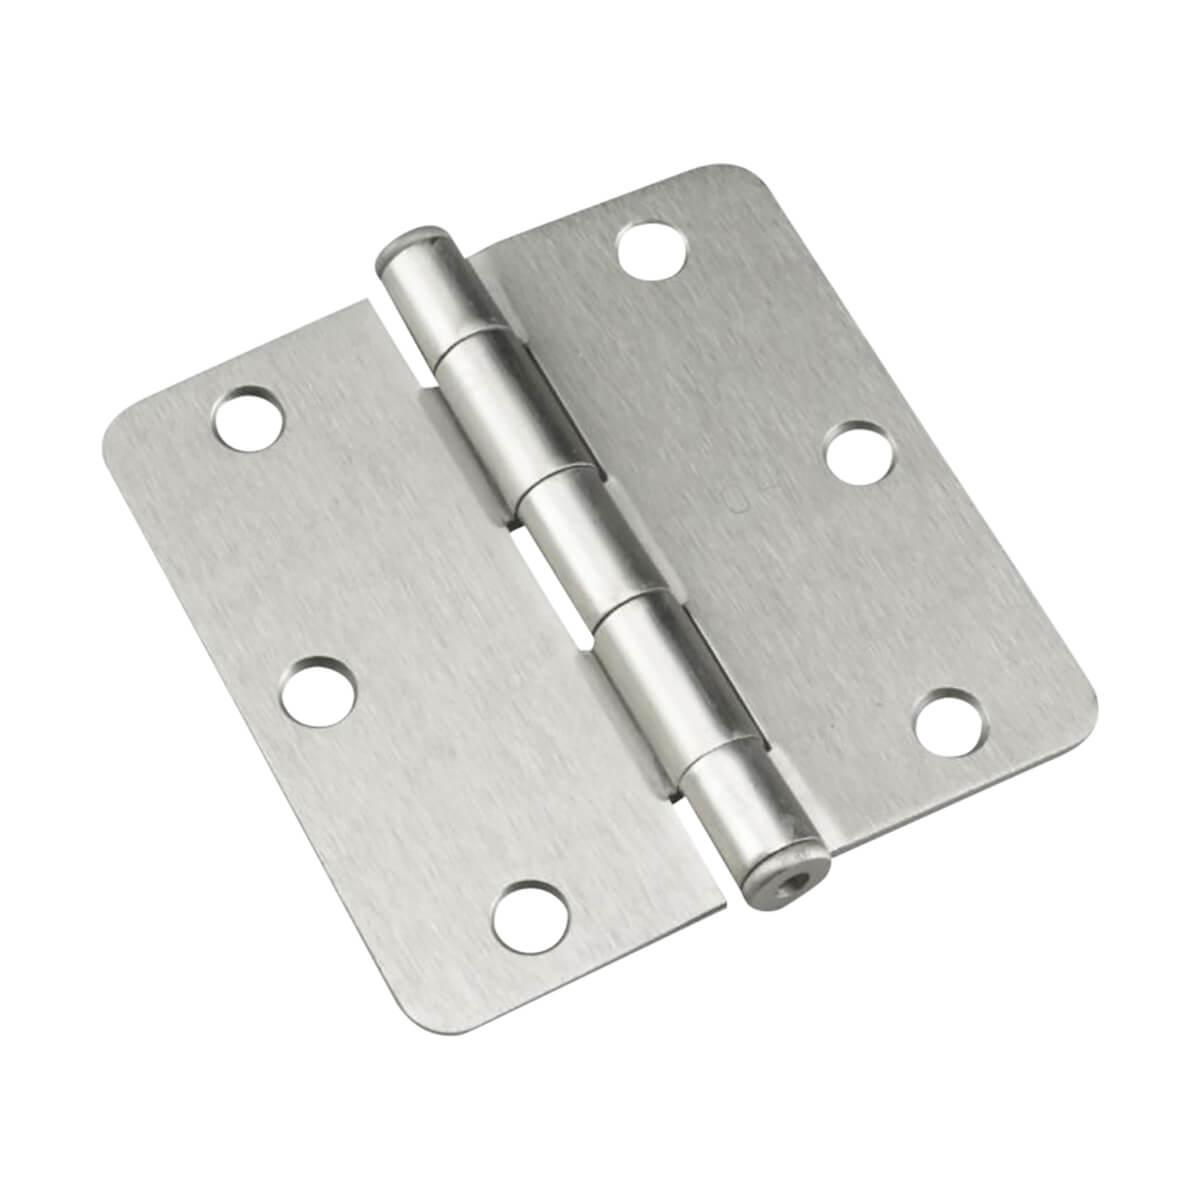 Full Mortise Butt Hinge - Brushed Nickel - 1/4-in Radius - 3-1/2-in